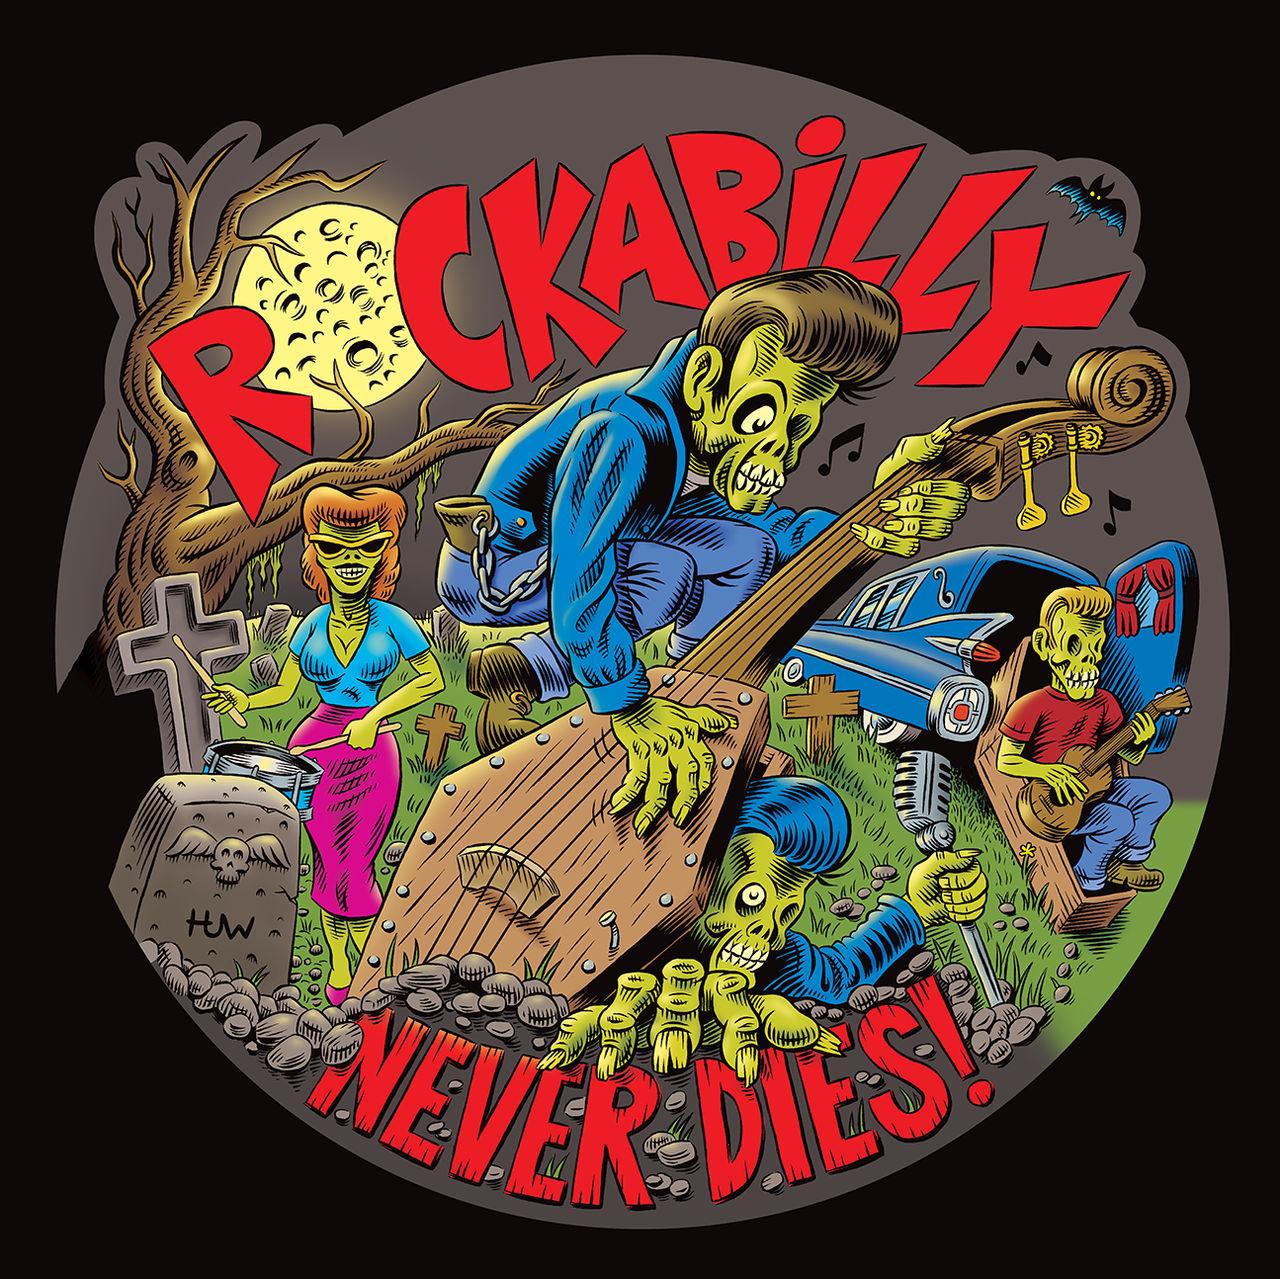 ROCKABILLY NEVER DIES!